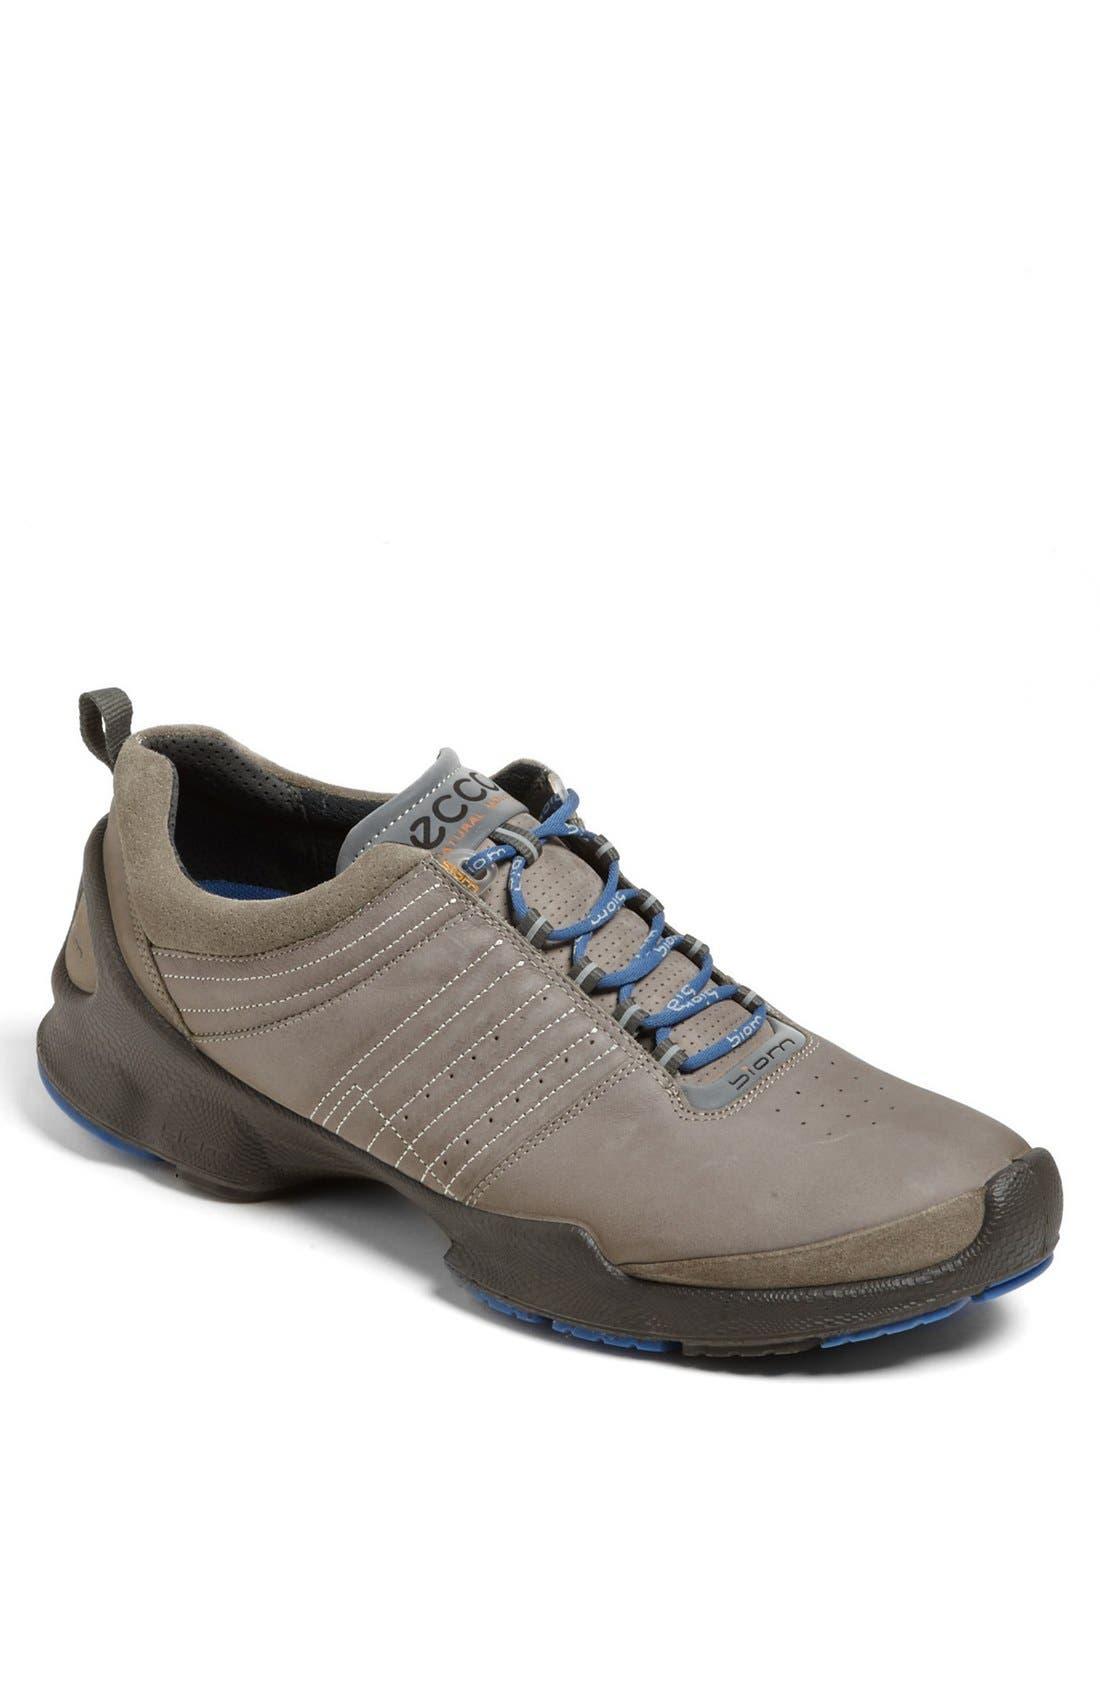 Alternate Image 1 Selected - ECCO 'Biom Training 1.1' Fitness Shoe (Men)